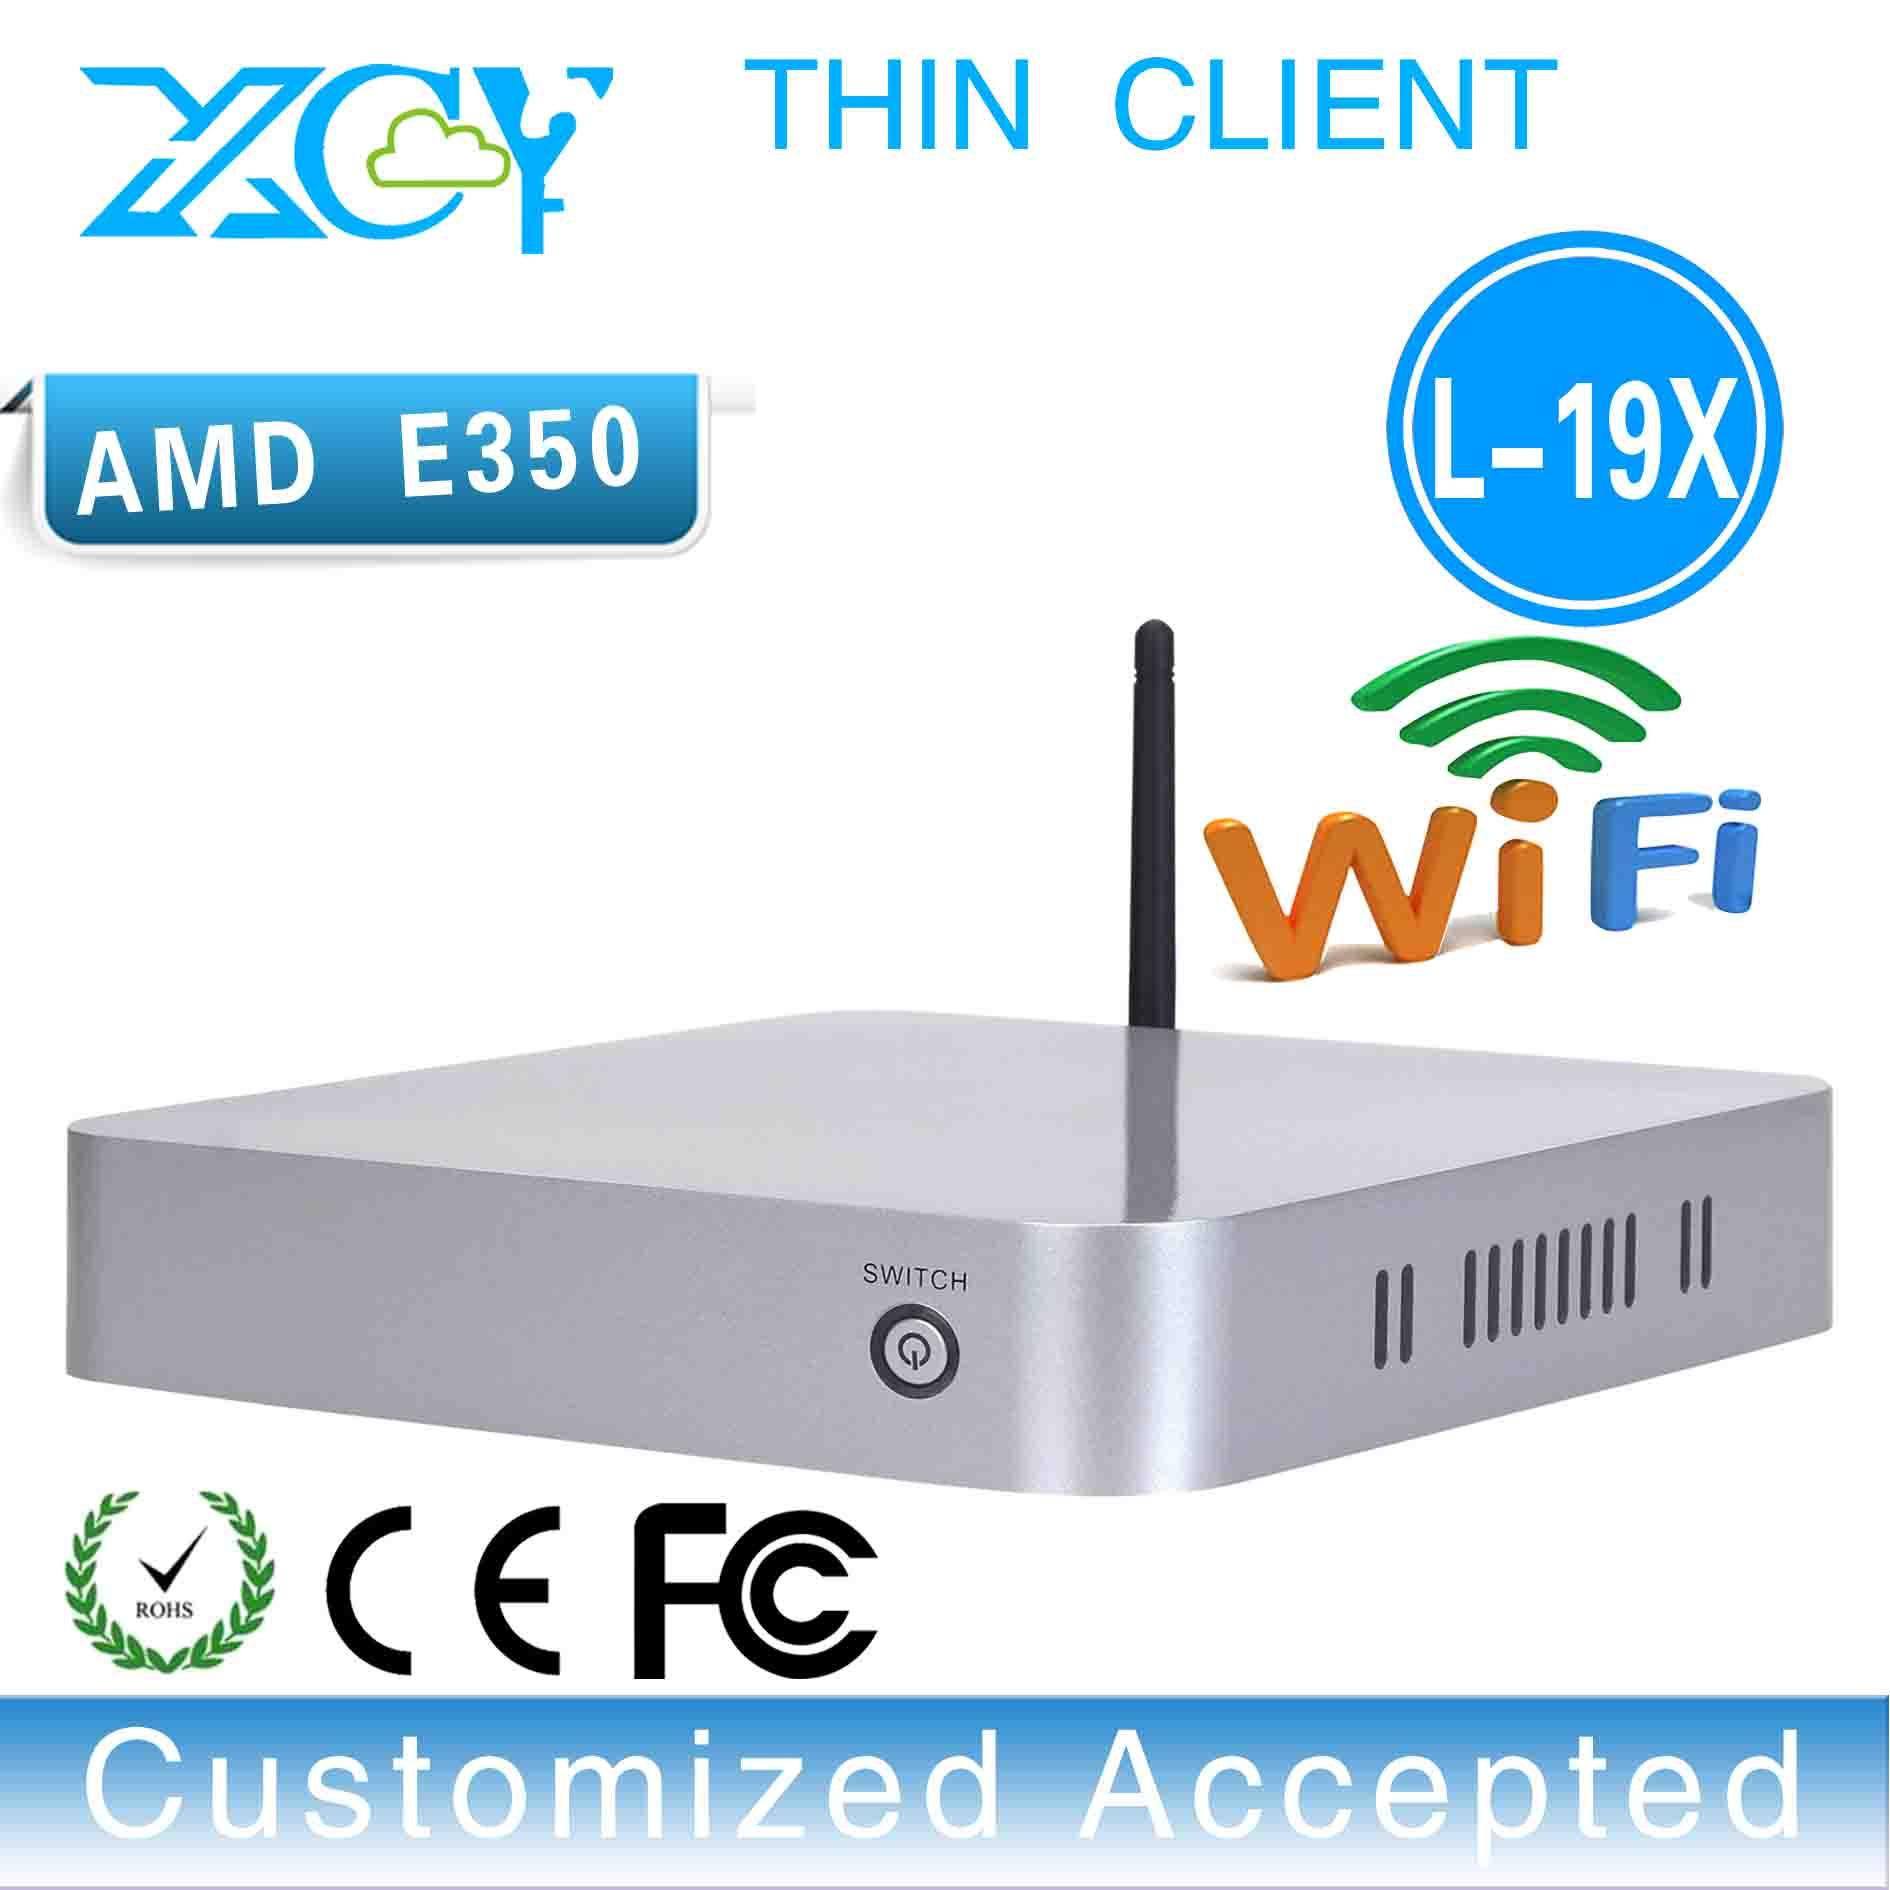 AMD E350 mini motherboard mini pc mini itx case htpc e350 mini computer support wireless keyboard mouse wifi earphone(China (Mainland))